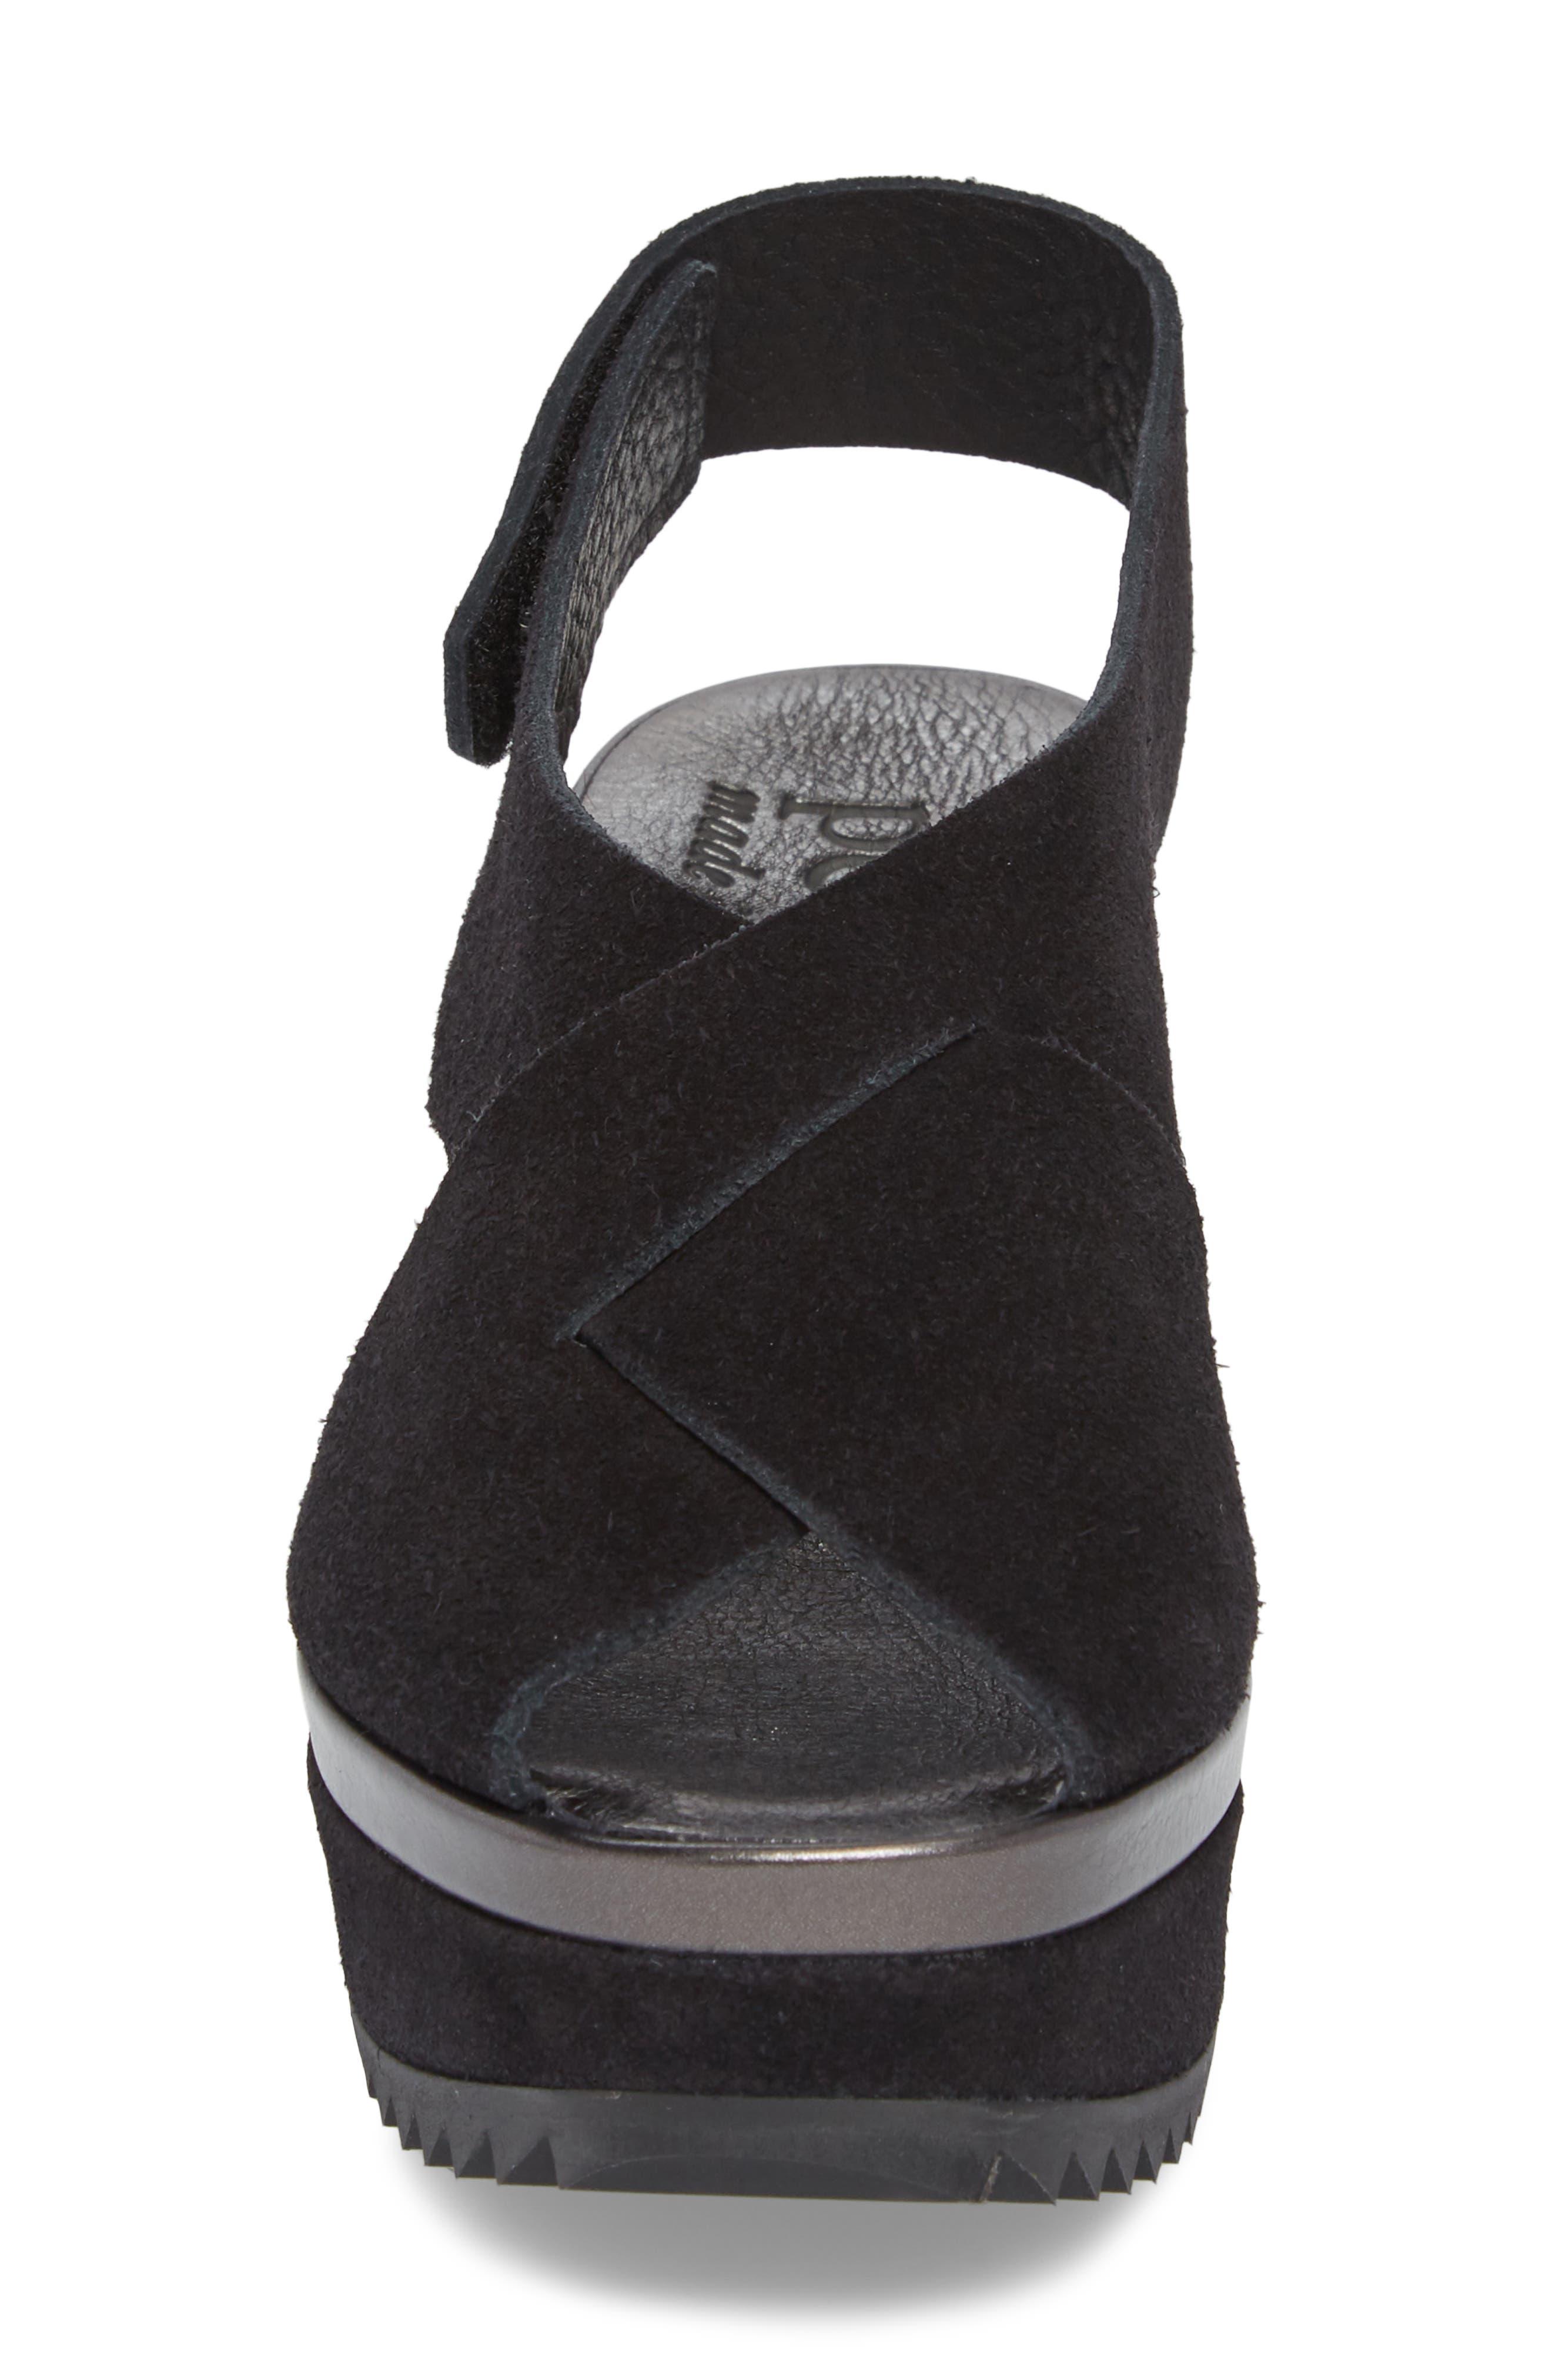 Fayre Cross Strap Wedge Sandal,                             Alternate thumbnail 4, color,                             BLACK